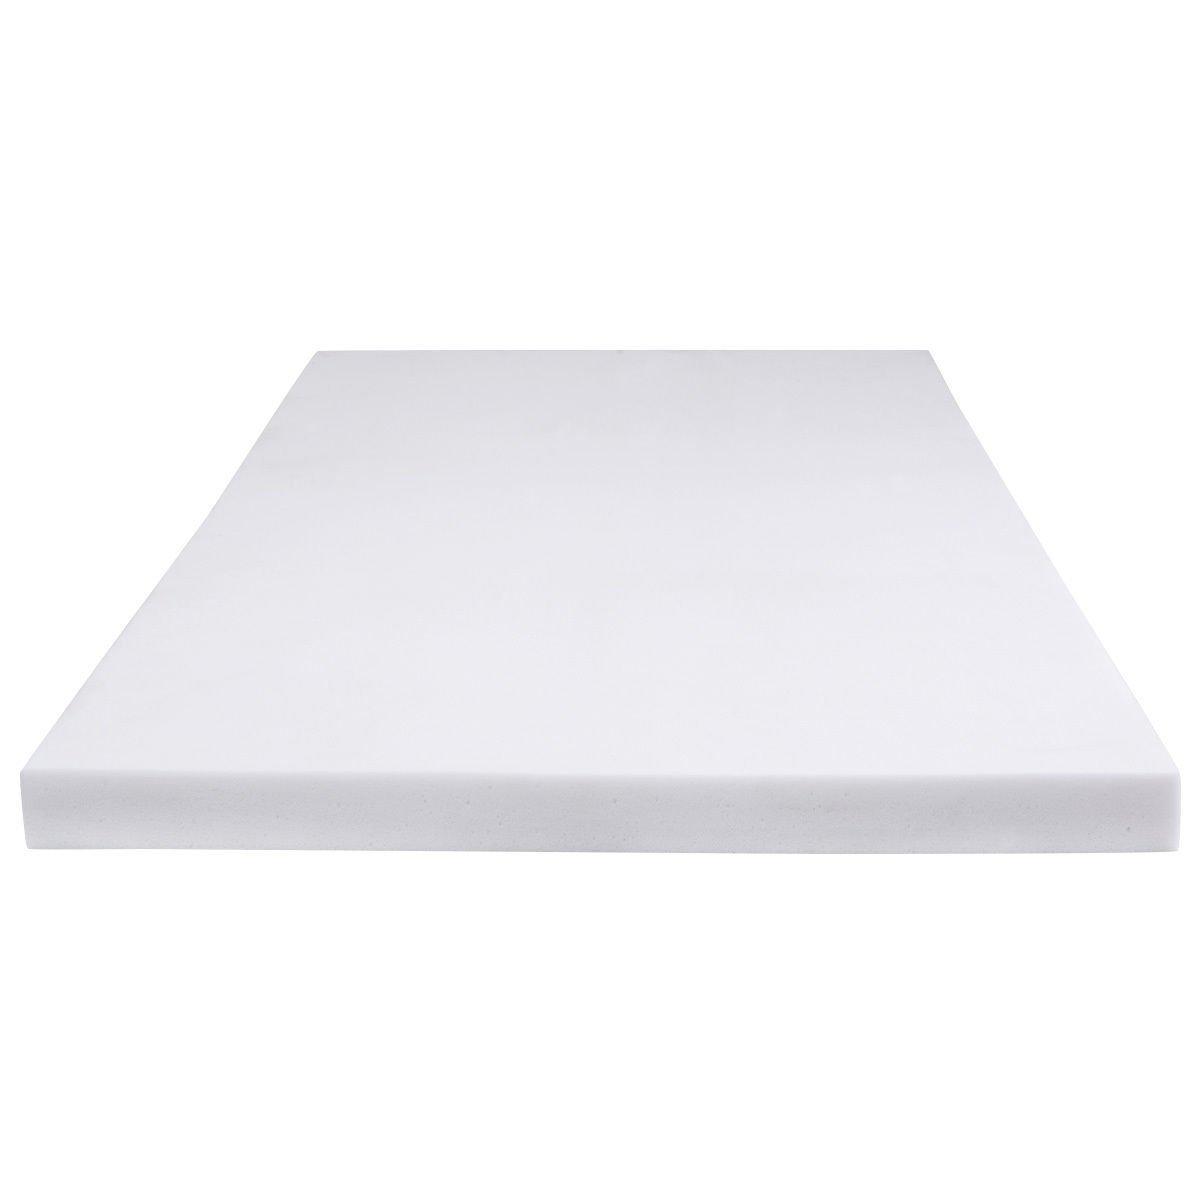 Giantex White 45D Memory Sponge Memory Foam Mattress Pad Bed Topper (Full size(75.0''X54.0''), 4'' thickness)